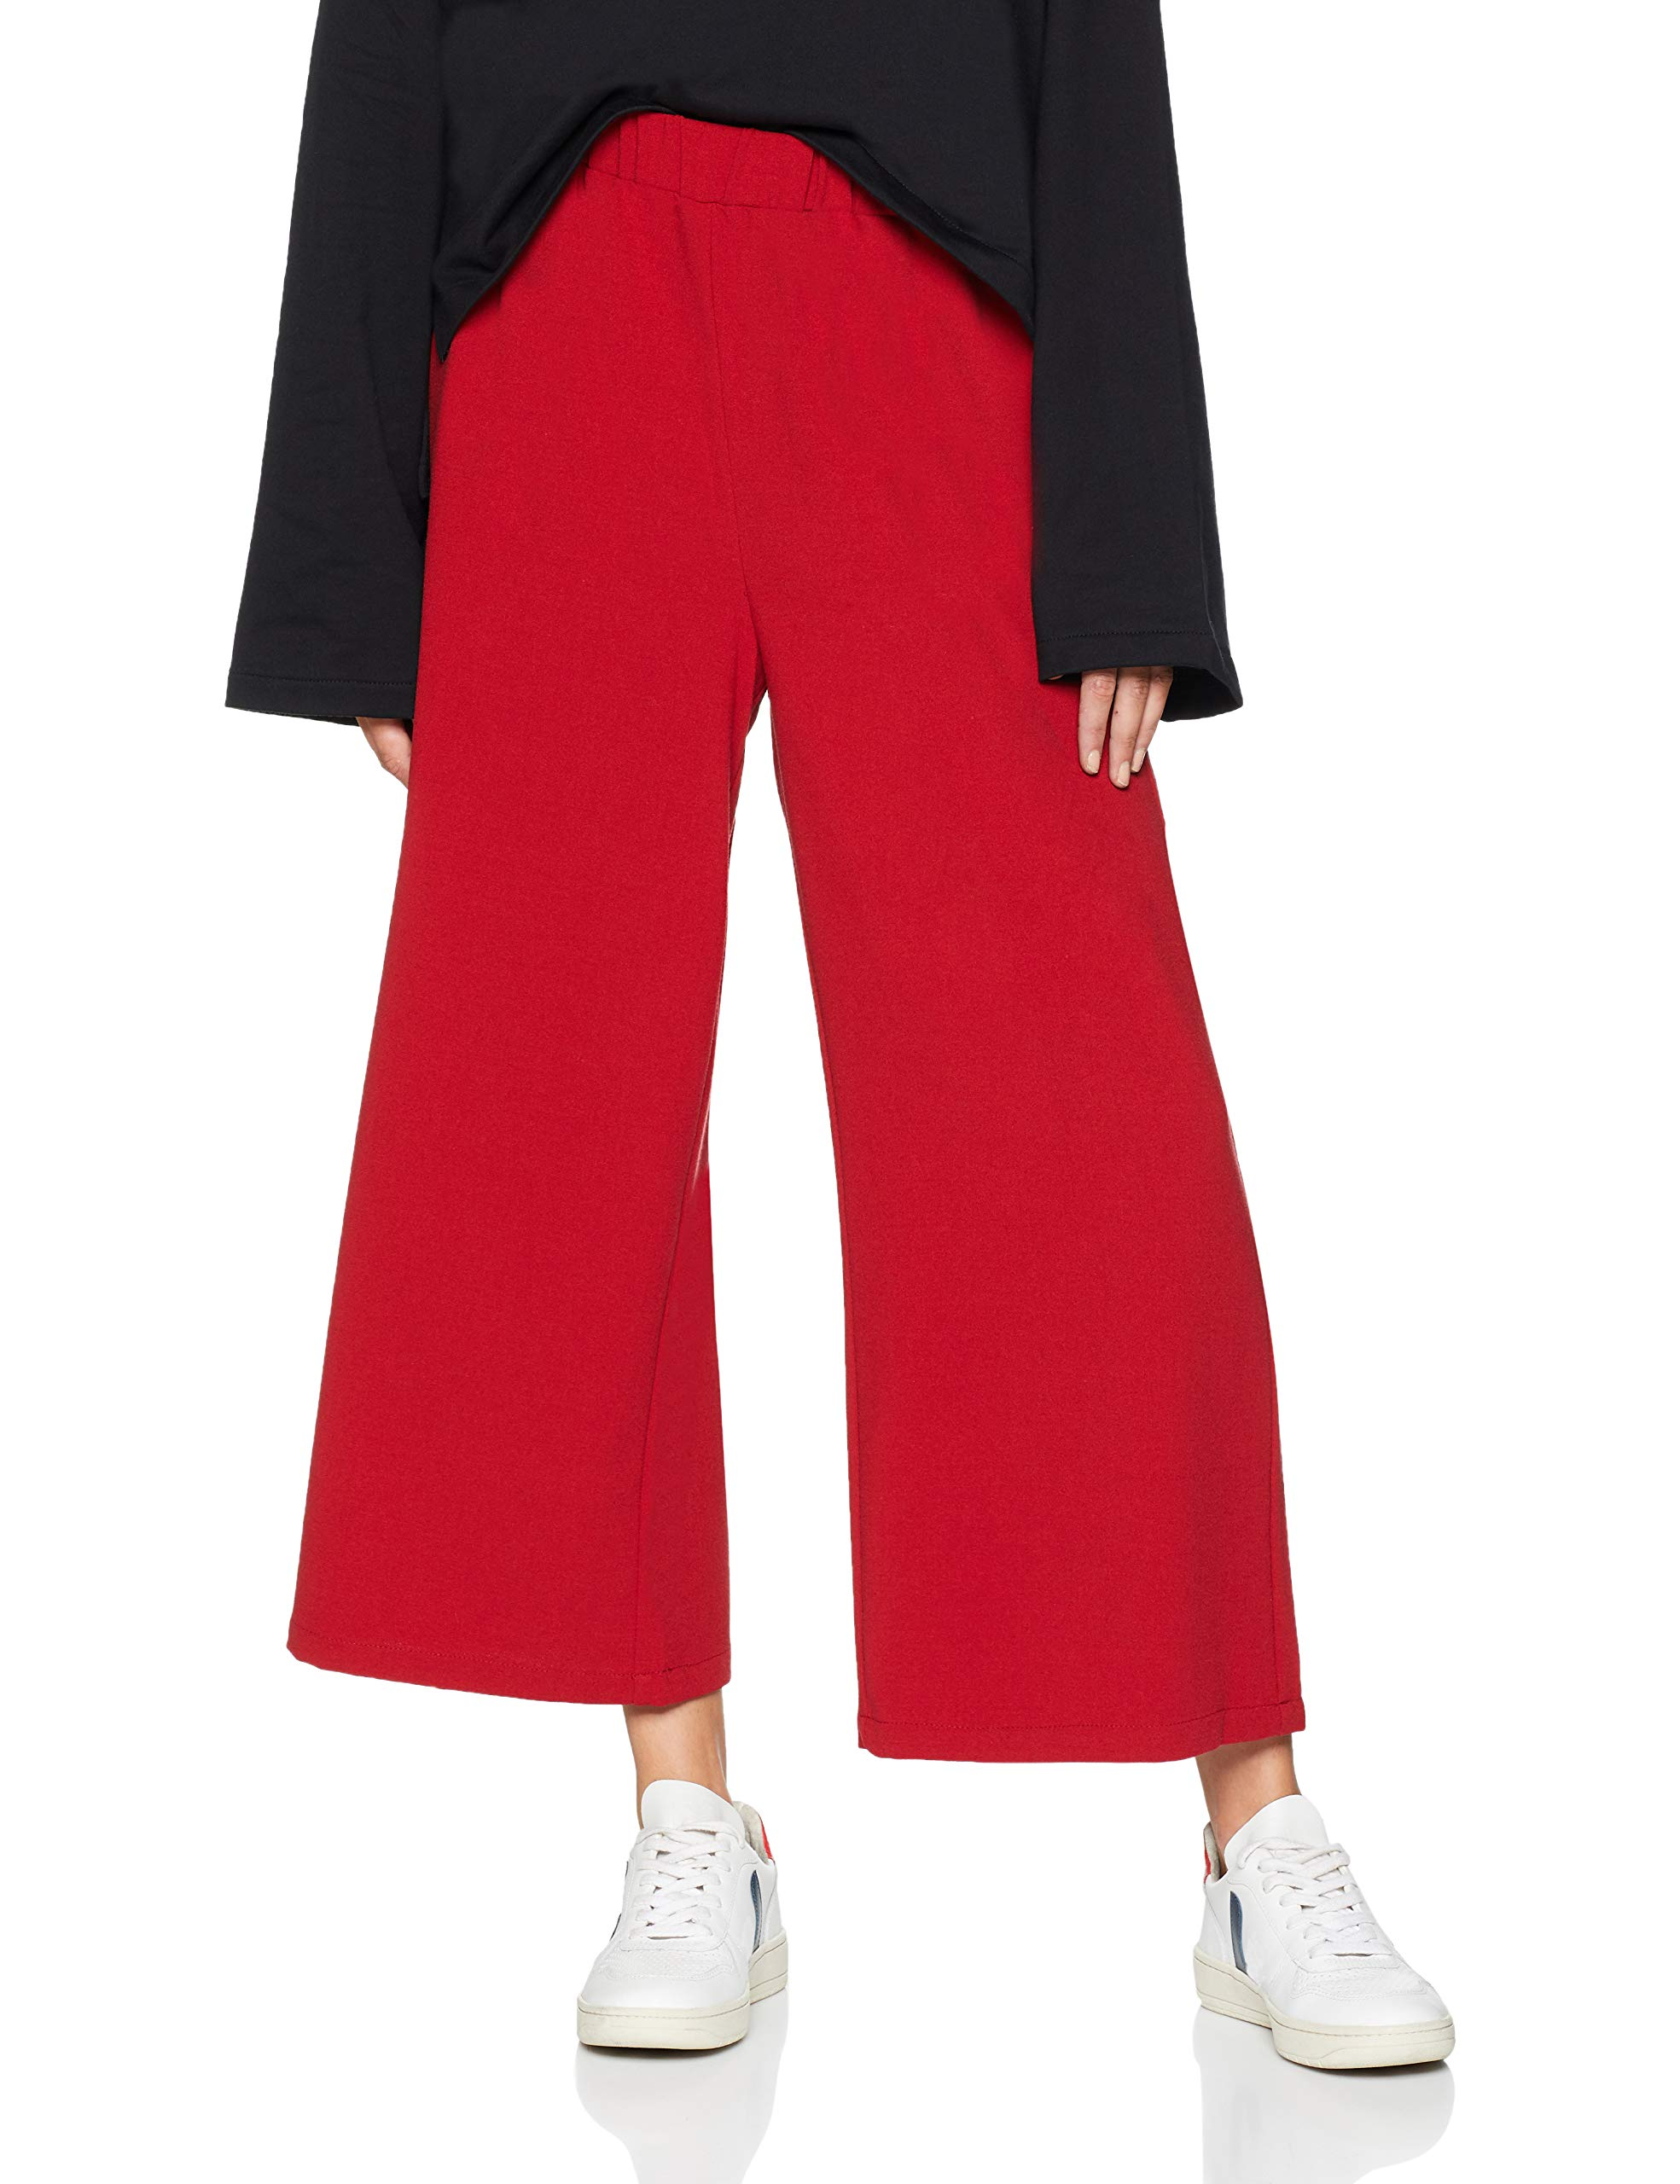 Trousers Red Abel PantalonBlood Femme DrDenim 415W29 SpUqVzM